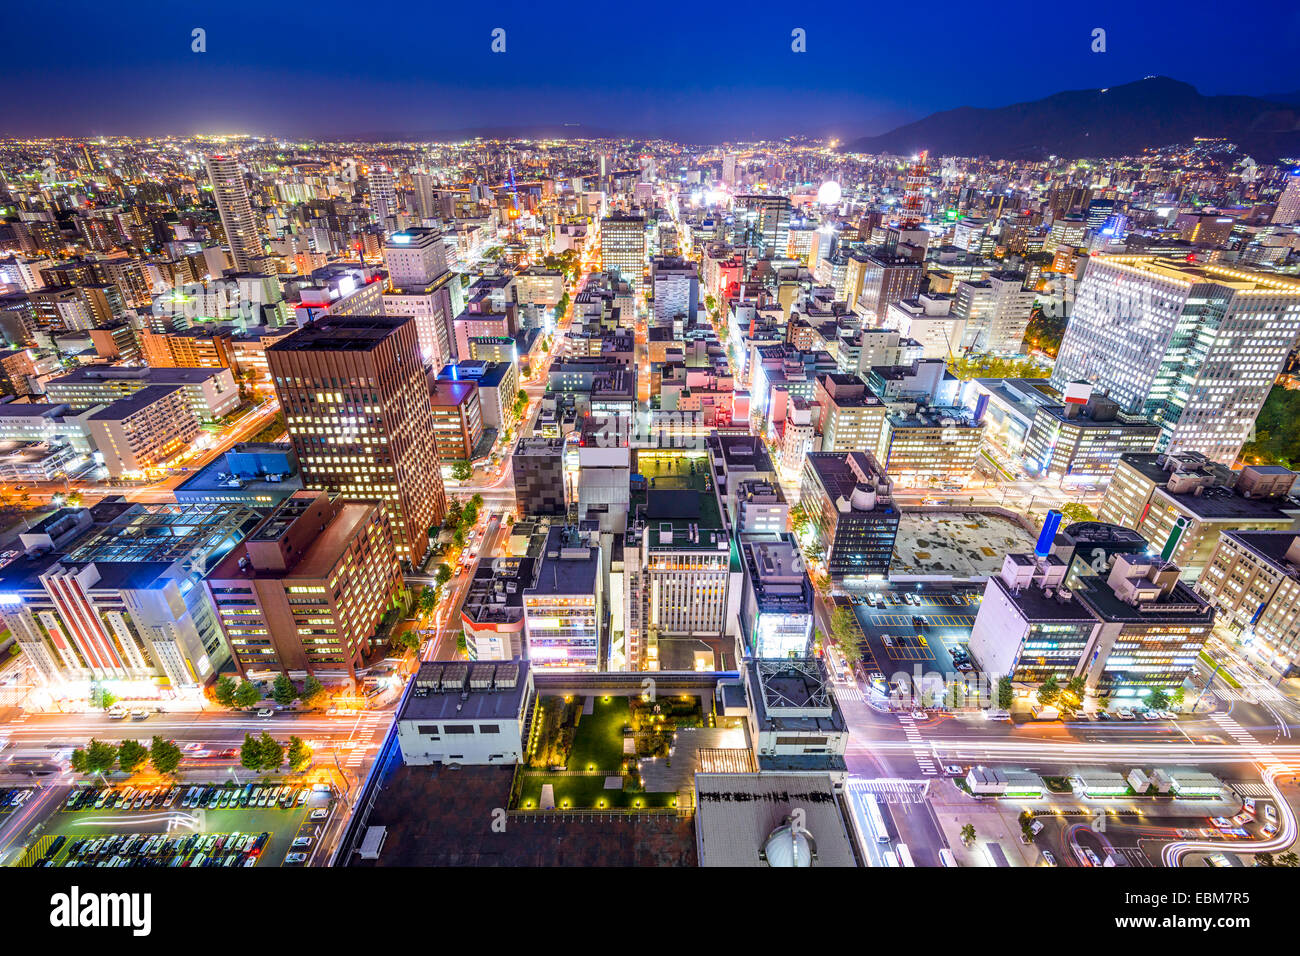 Sapporo, Hokkaido, Japan cityscape in the Chuo Central Ward. - Stock Image